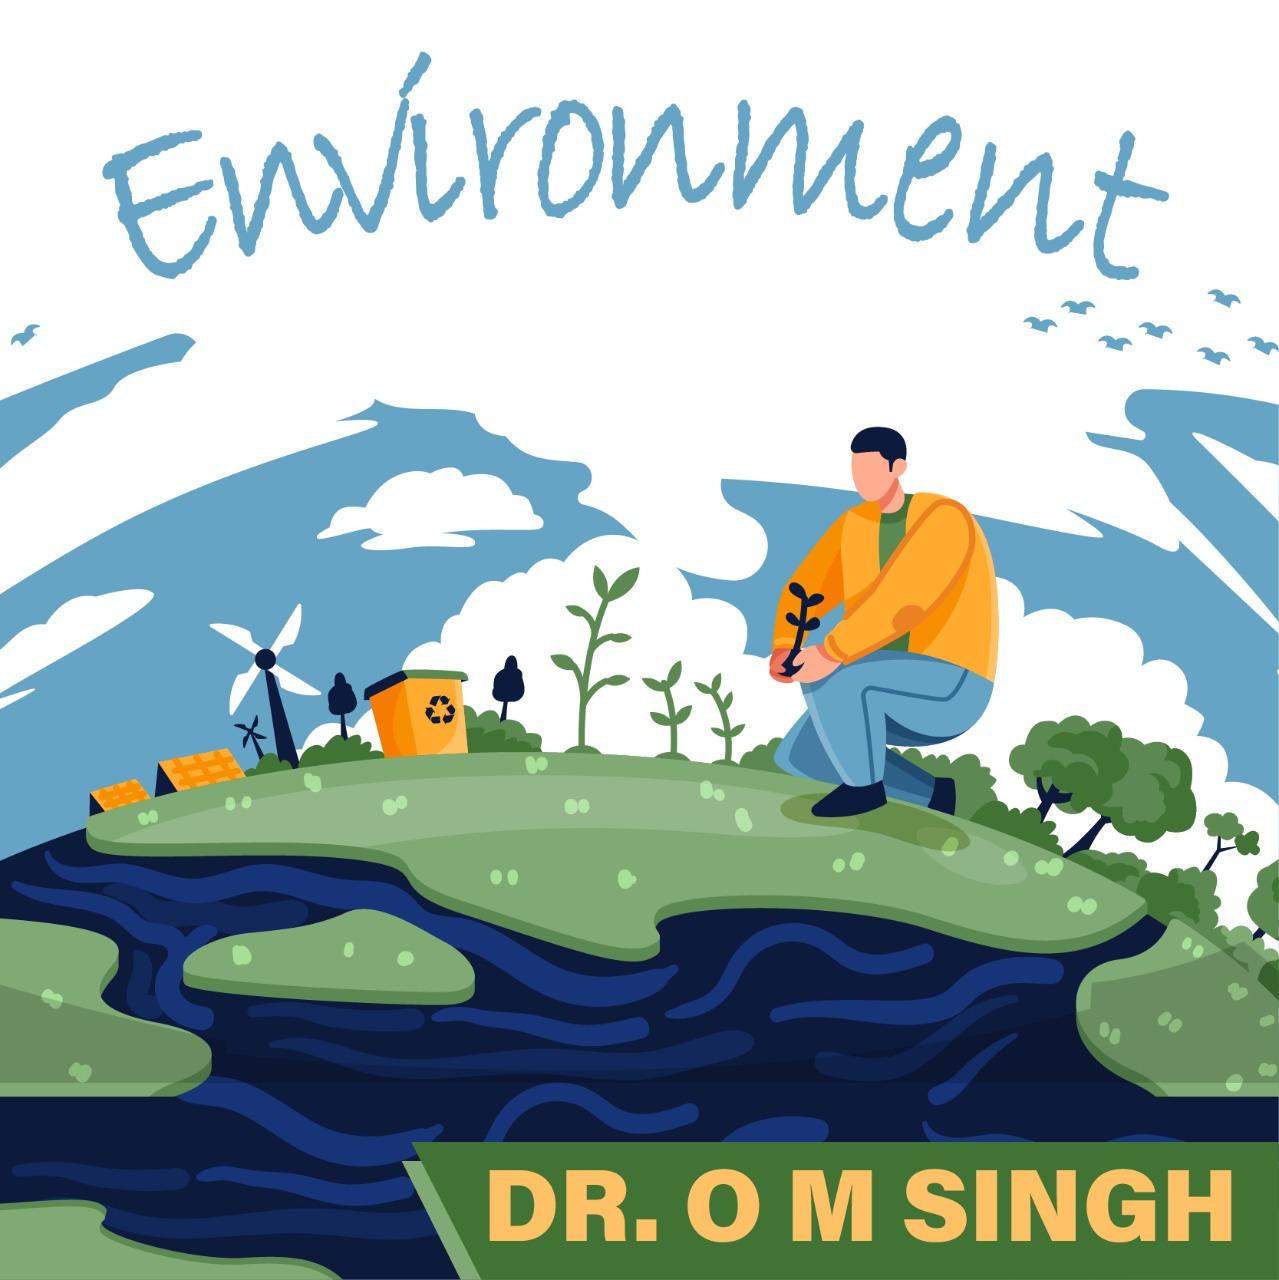 Dr O M Singh - ECOLOGY & ENVIRONMENT